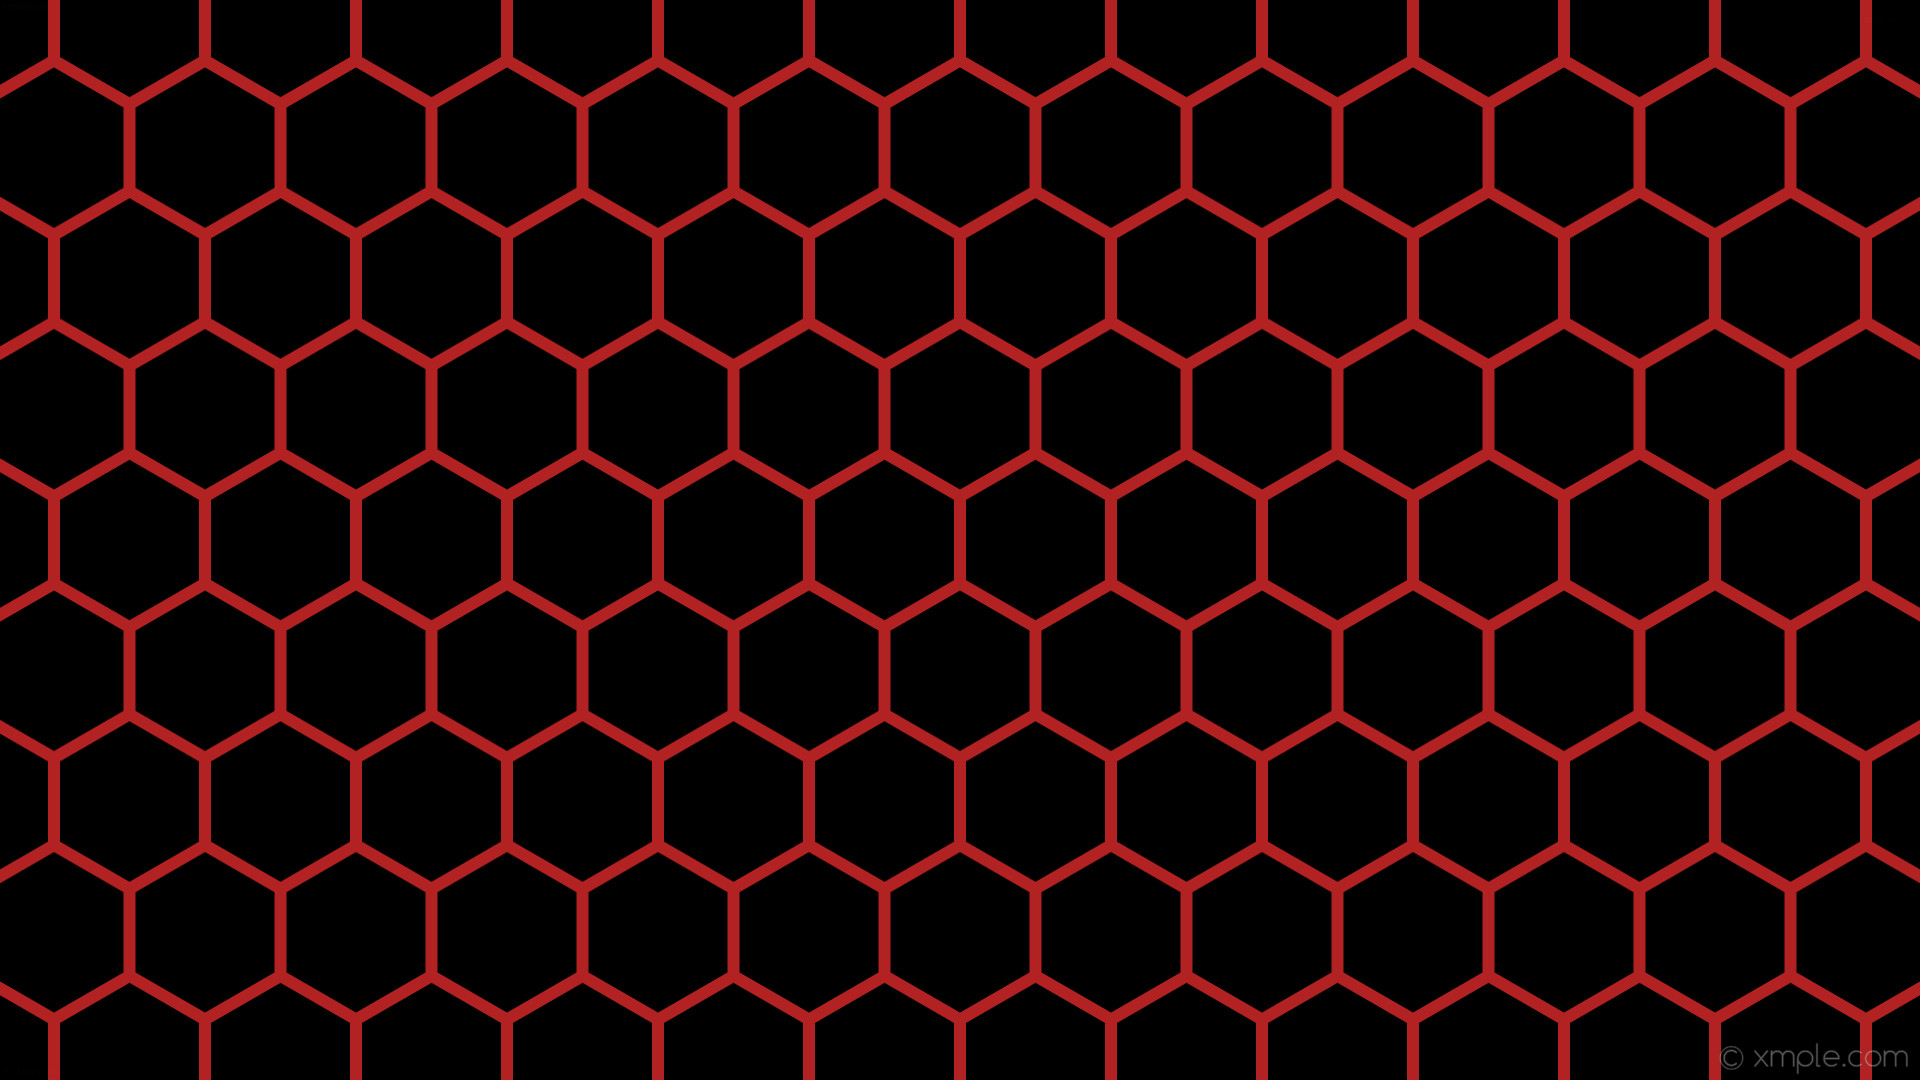 wallpaper beehive red honeycomb hexagon black fire brick #000000 #b22222 0°  12px 151px